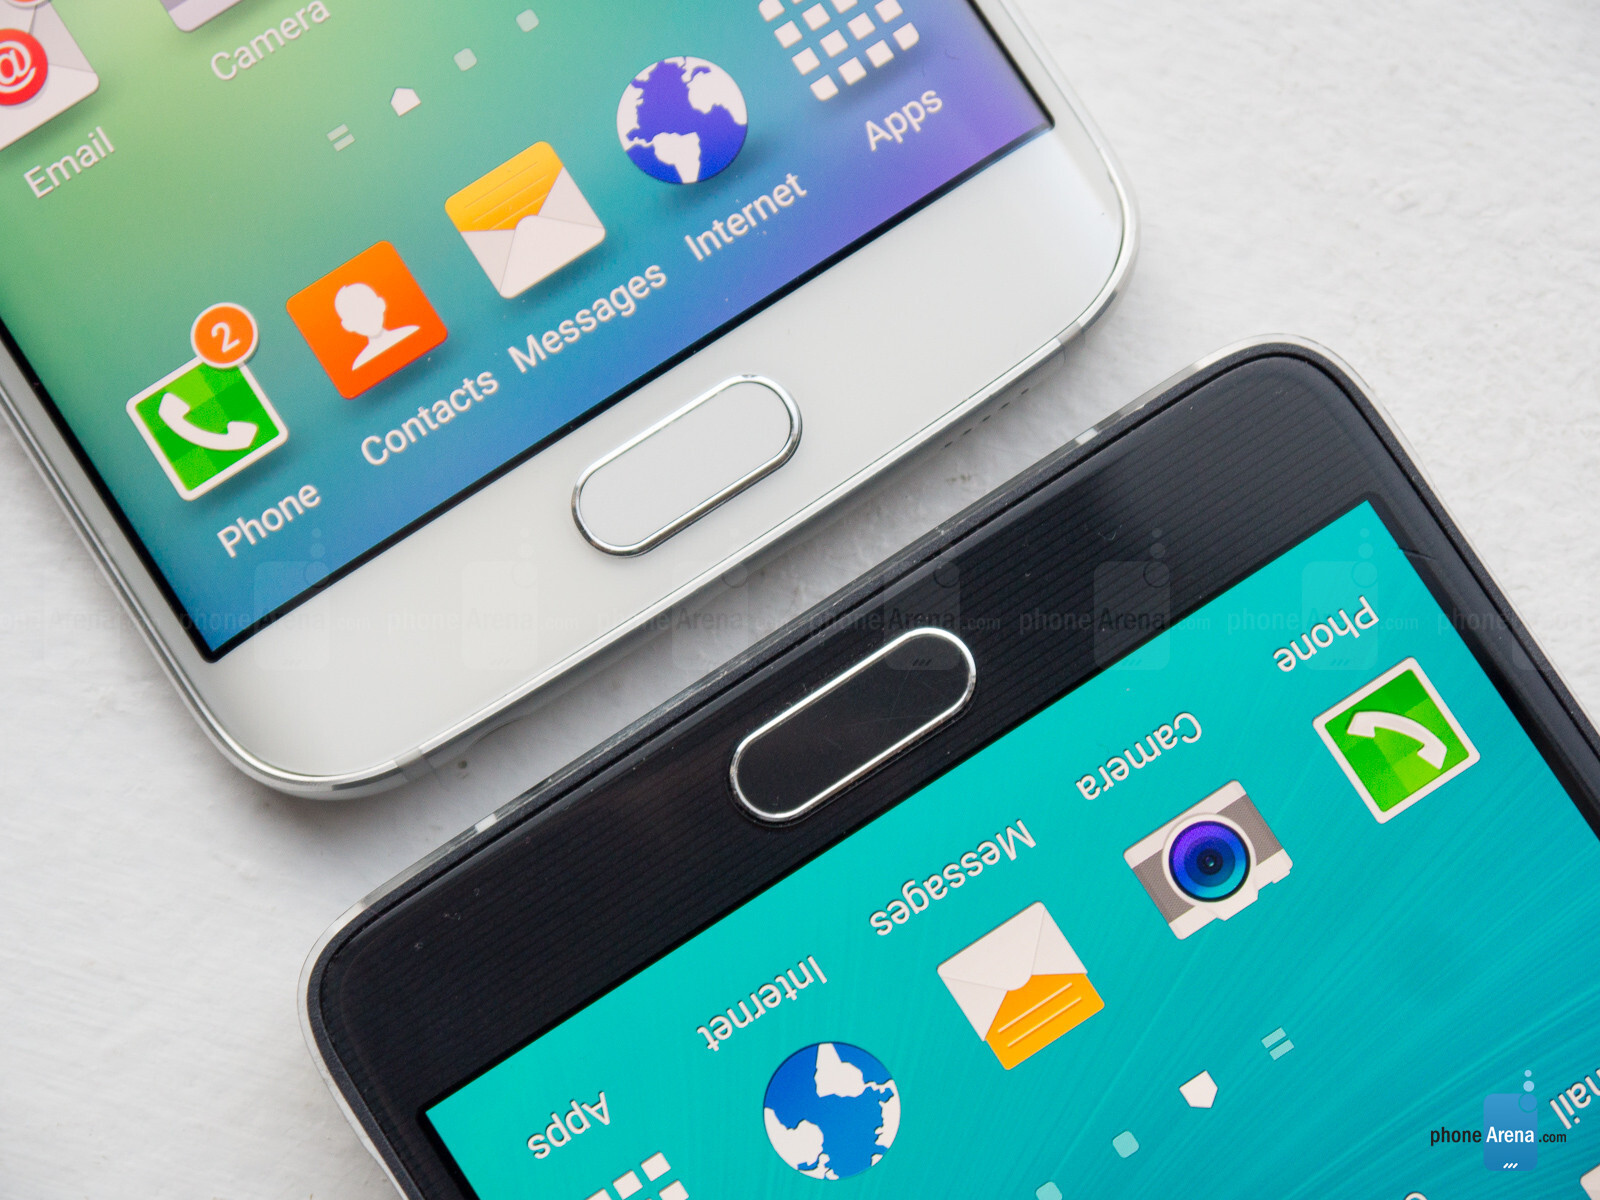 Samsung Galaxy S6 edge vs Samsung Galaxy Note 4 - PhoneArena